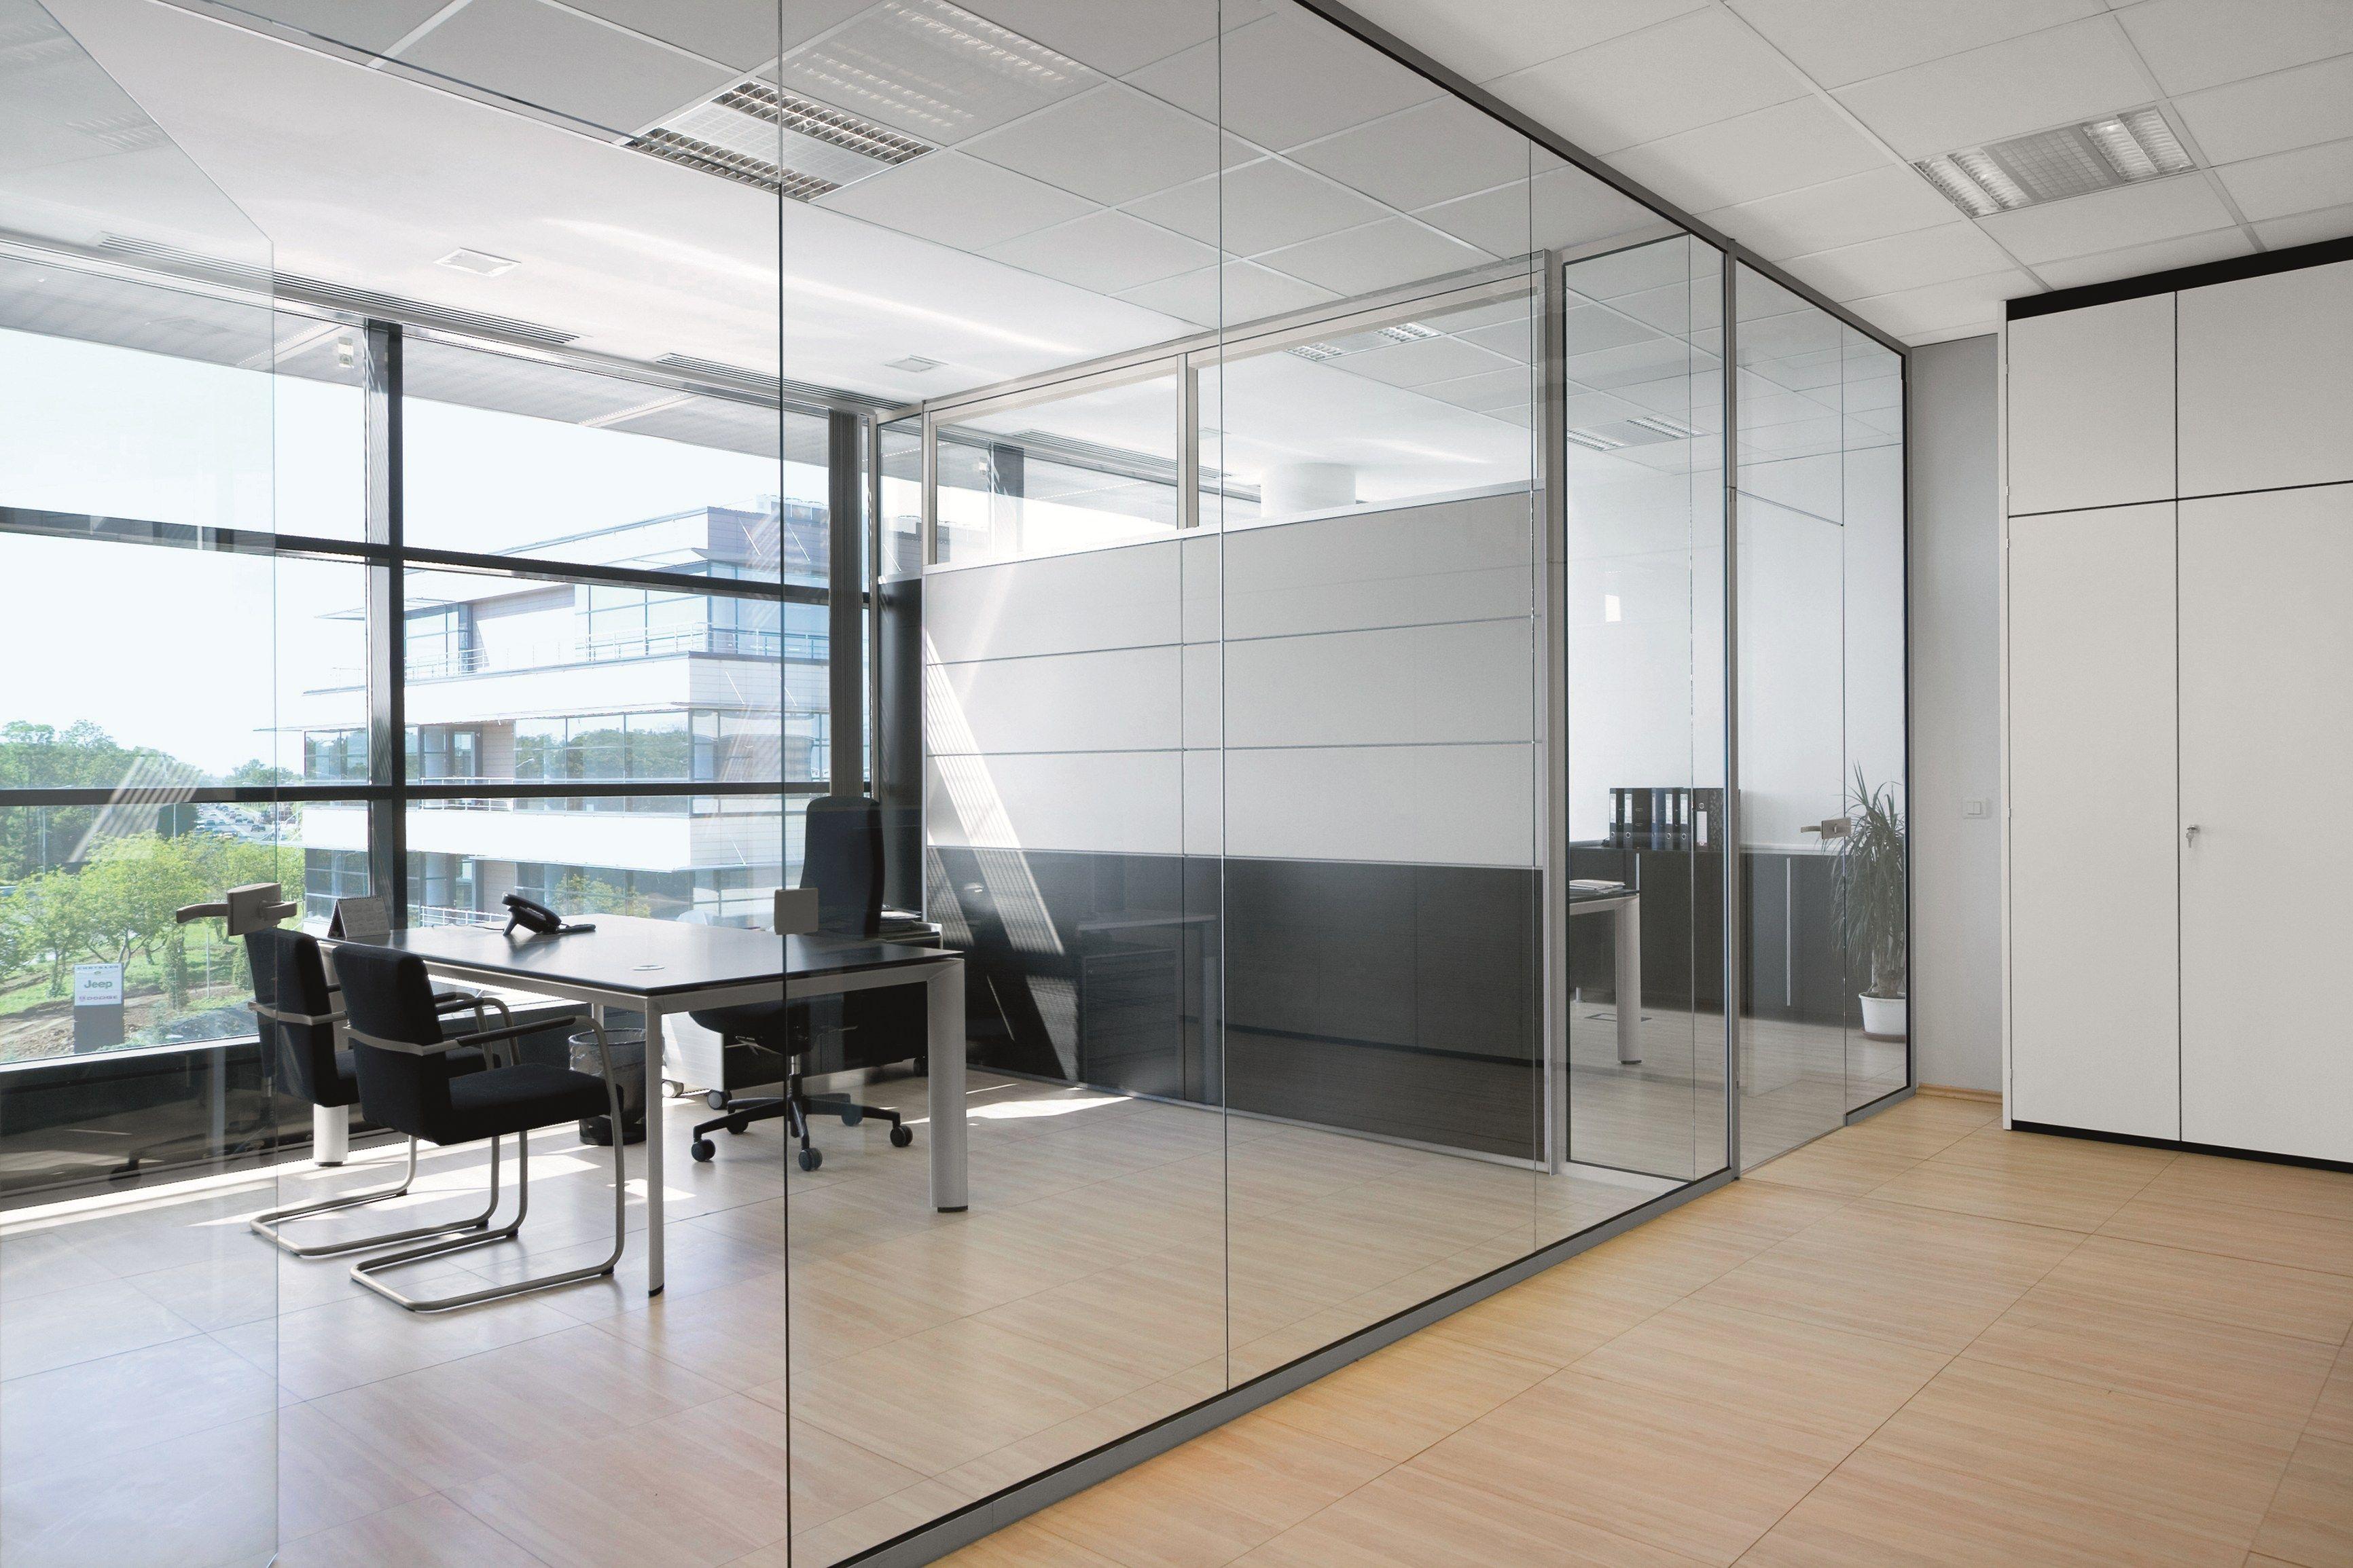 cloison amovible de bureau en verre cloison amovible vitre rg bene sales office ideas. Black Bedroom Furniture Sets. Home Design Ideas